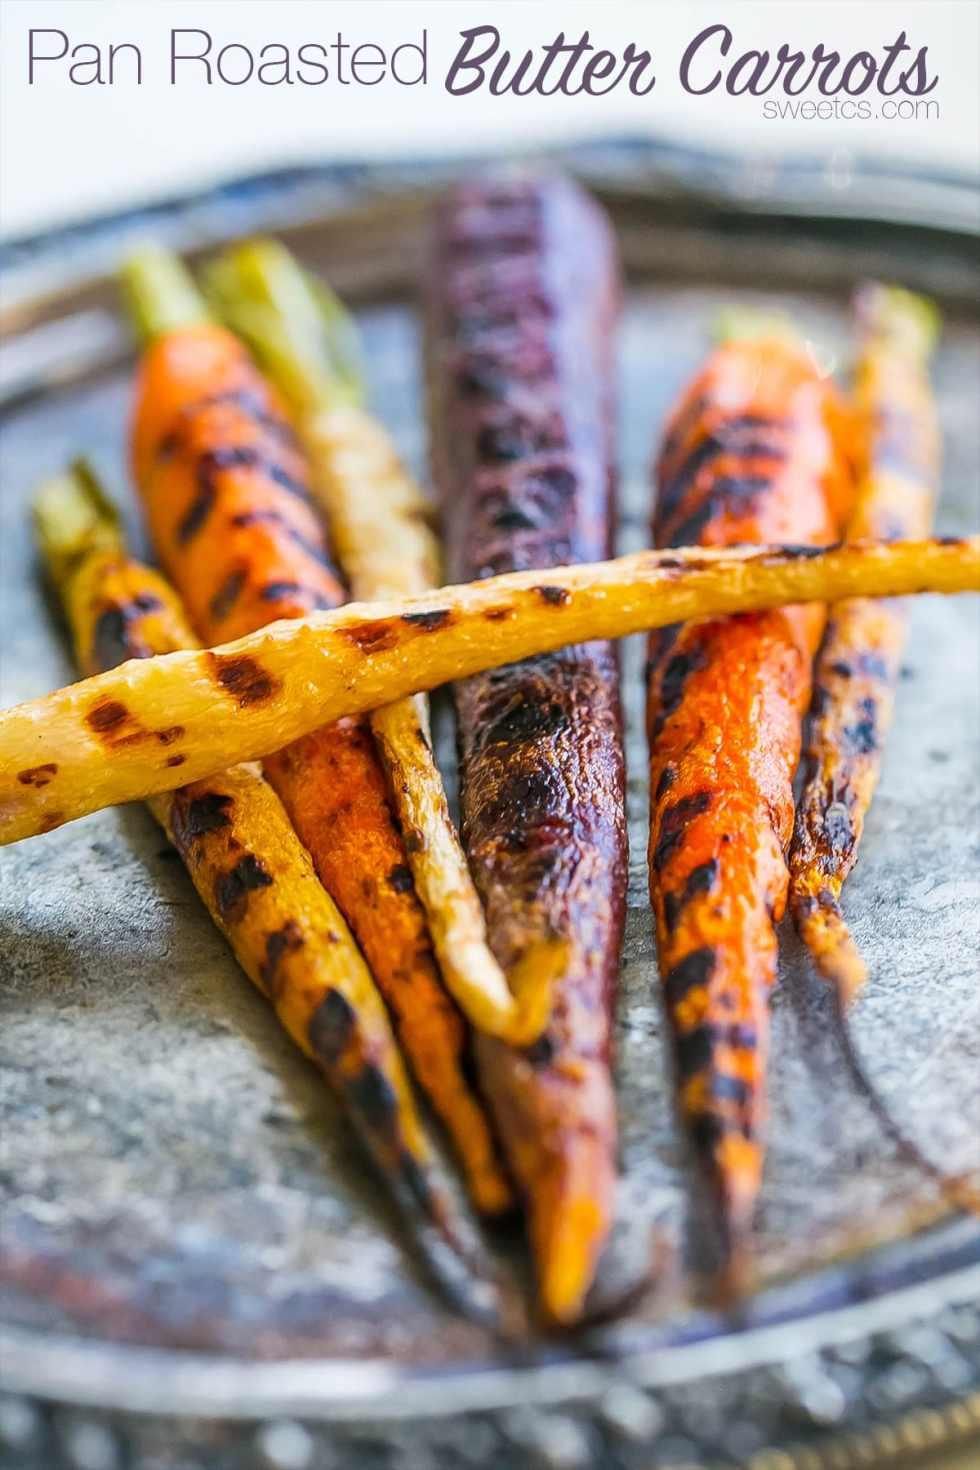 Butter Carrots {Sweet C's}